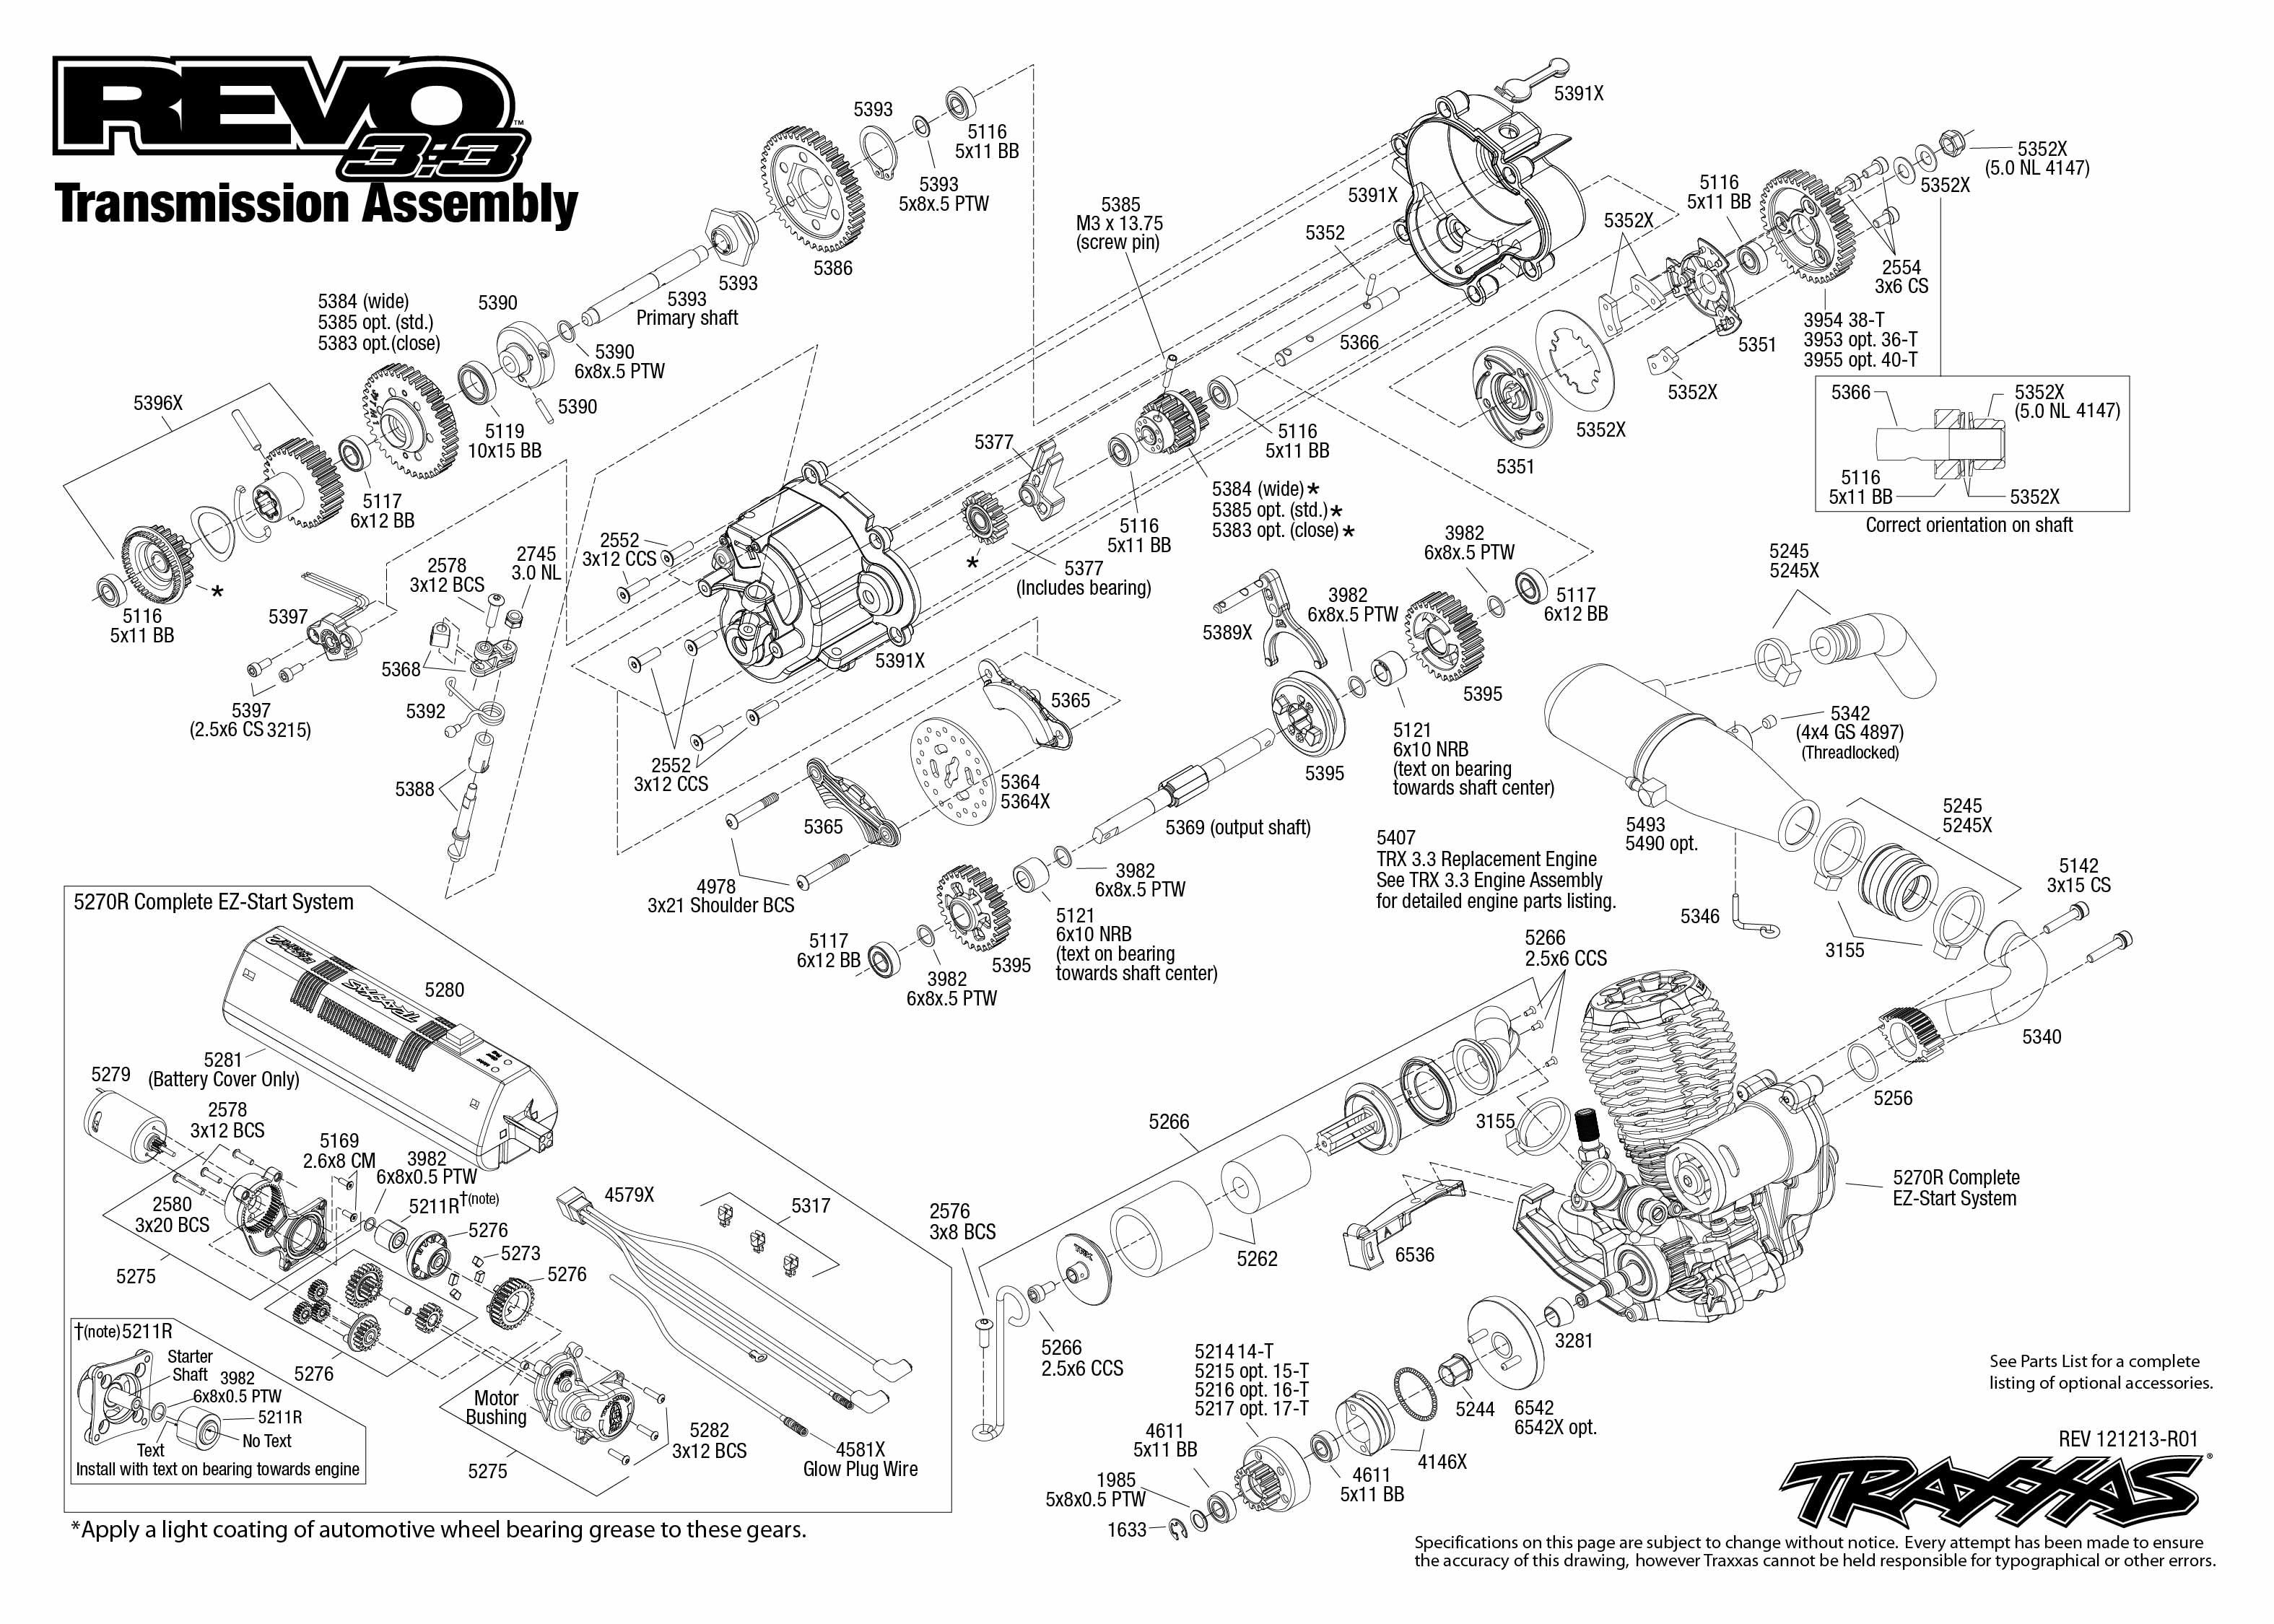 Traxxas Nitro Sport Parts Diagram Rustler For Revo Transmission Stampede E Brushless Edition 3150x2250